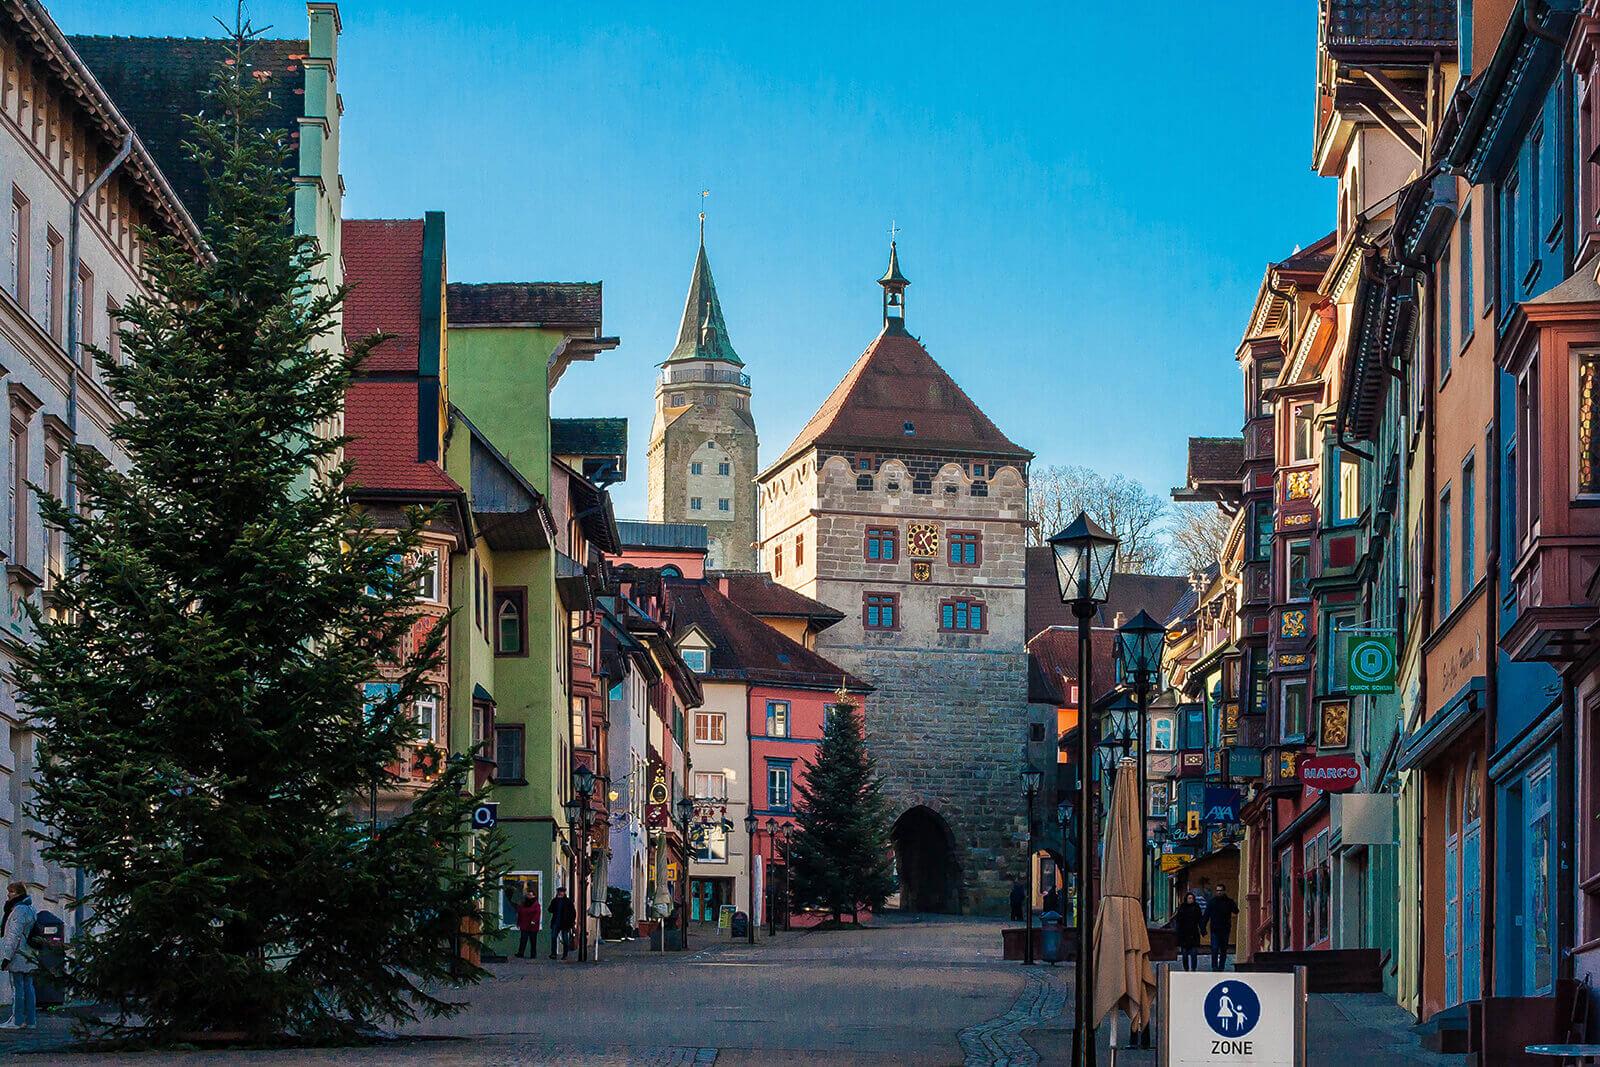 Vertragsrecht Rottweil Schust & Federle Stadt